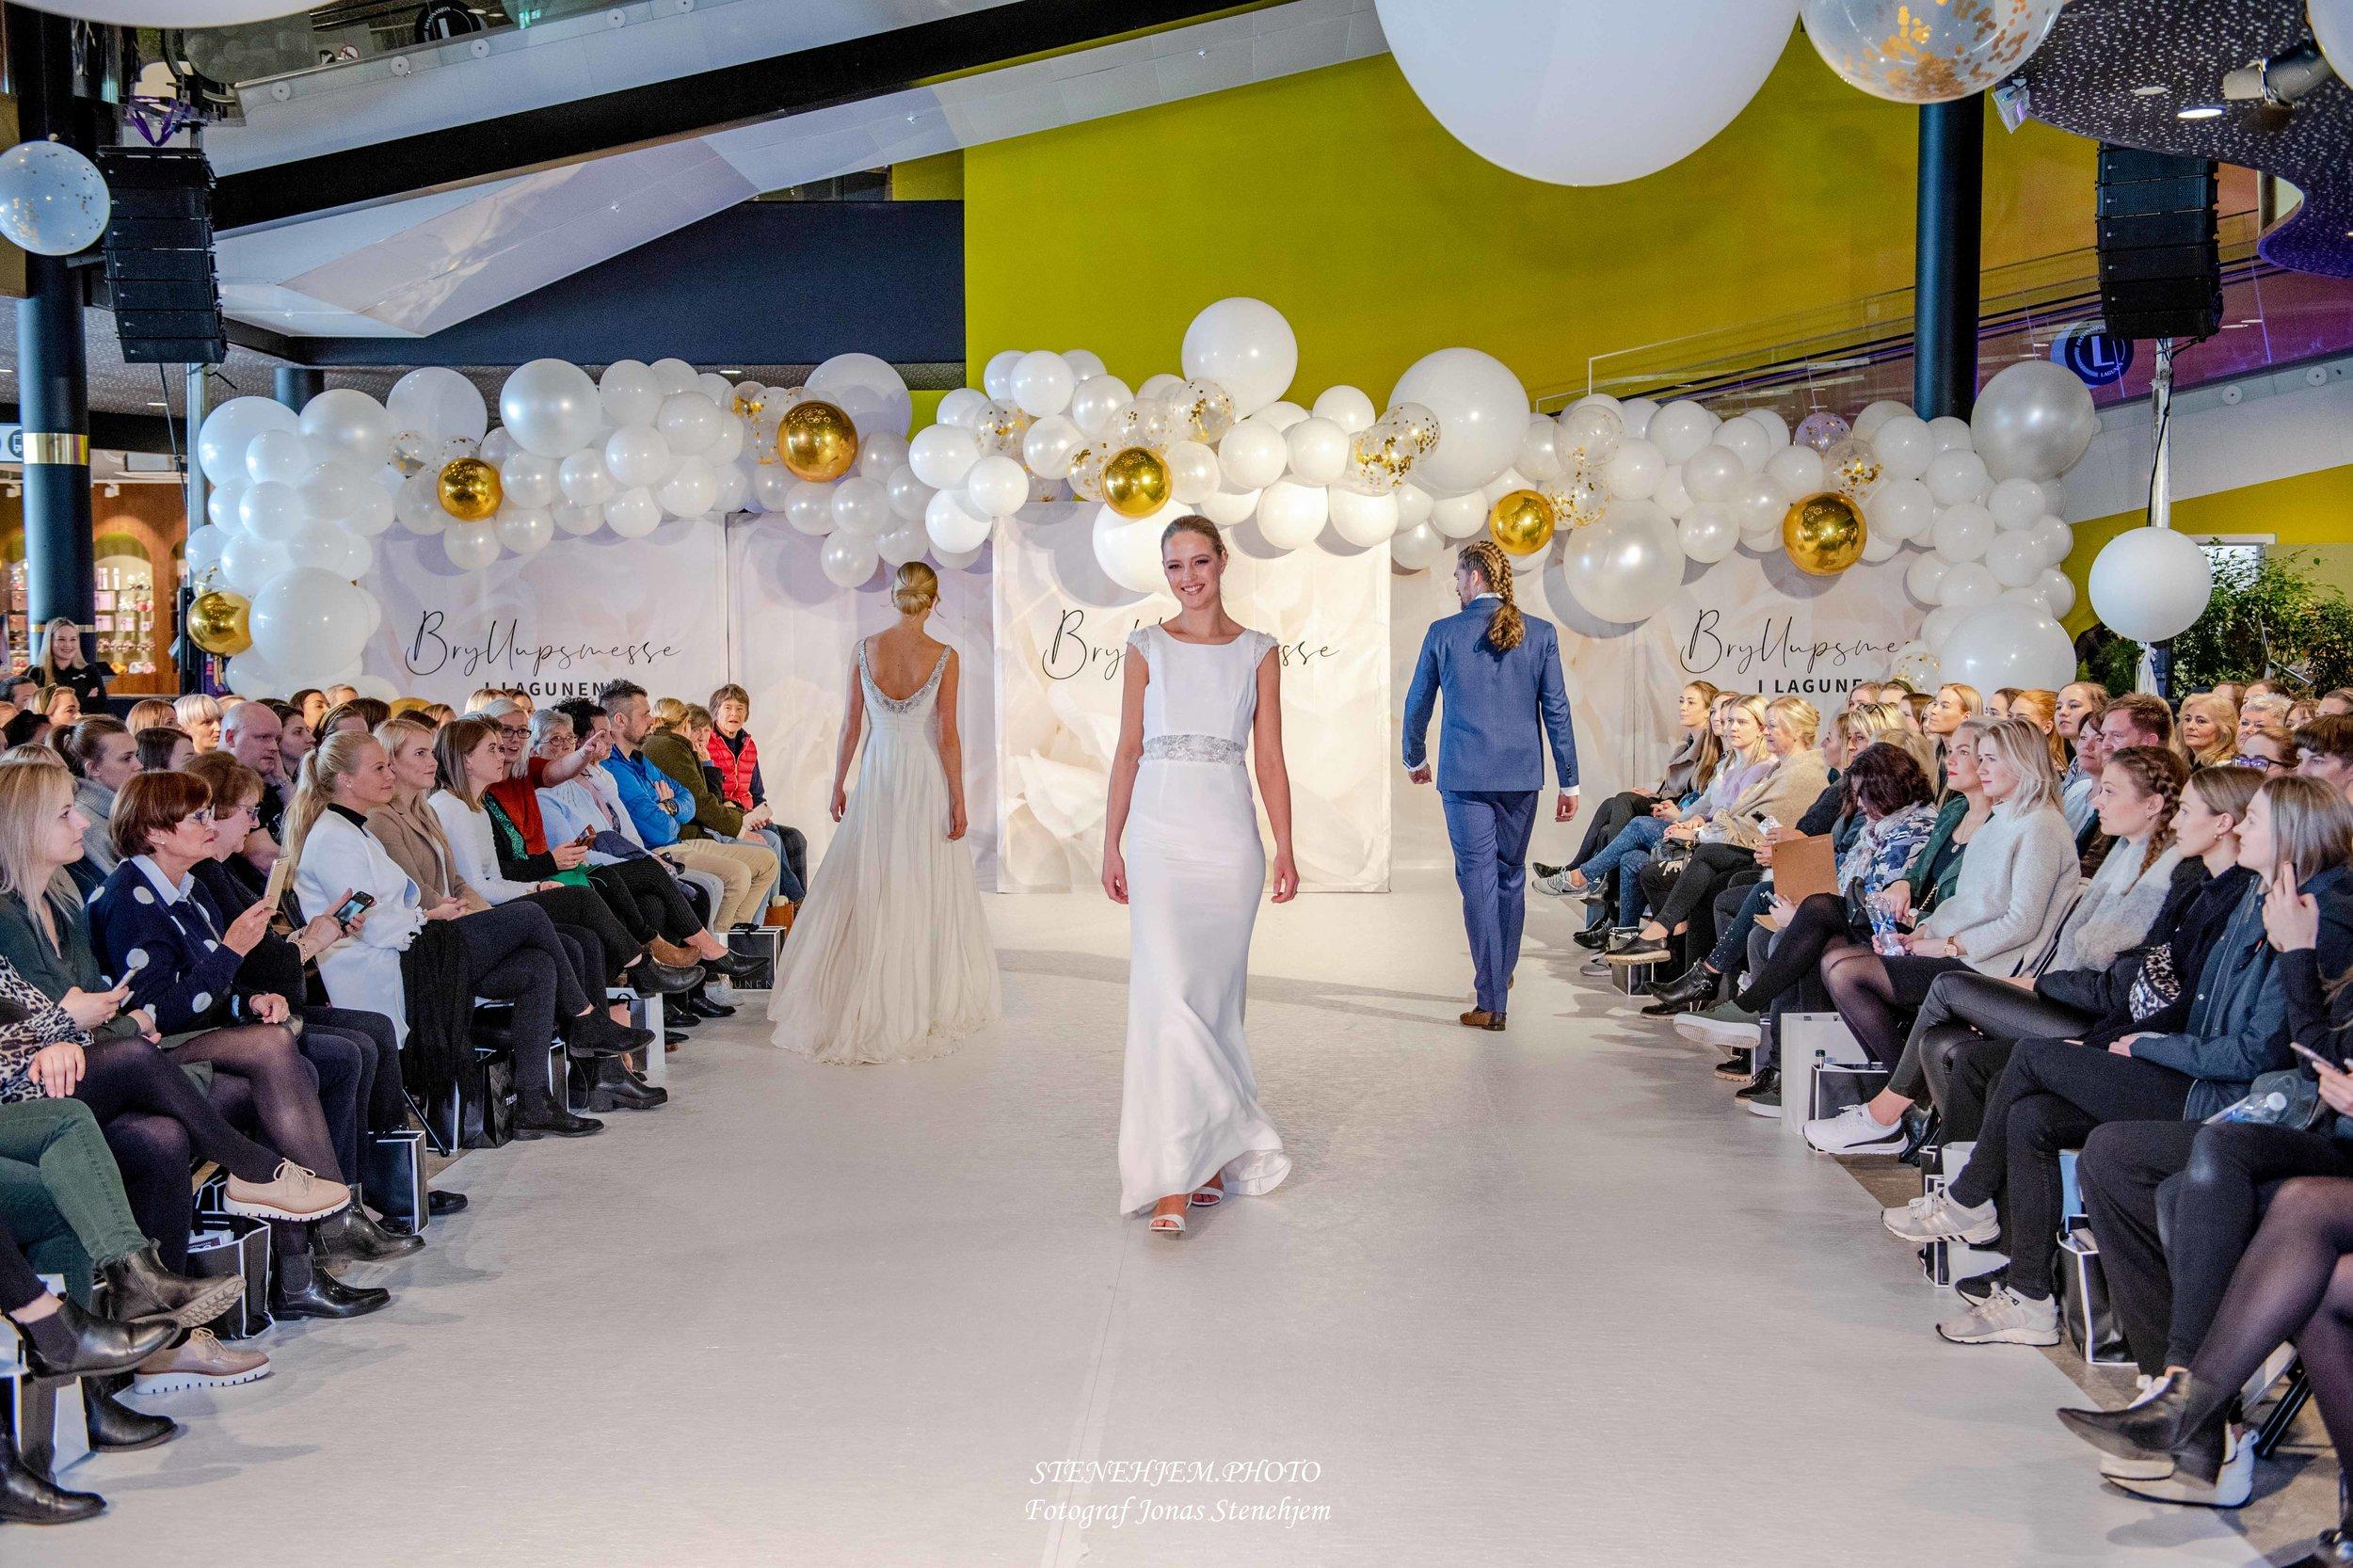 Bryllupsmesse_Lagunen_mittaltweddingfair__042.jpg